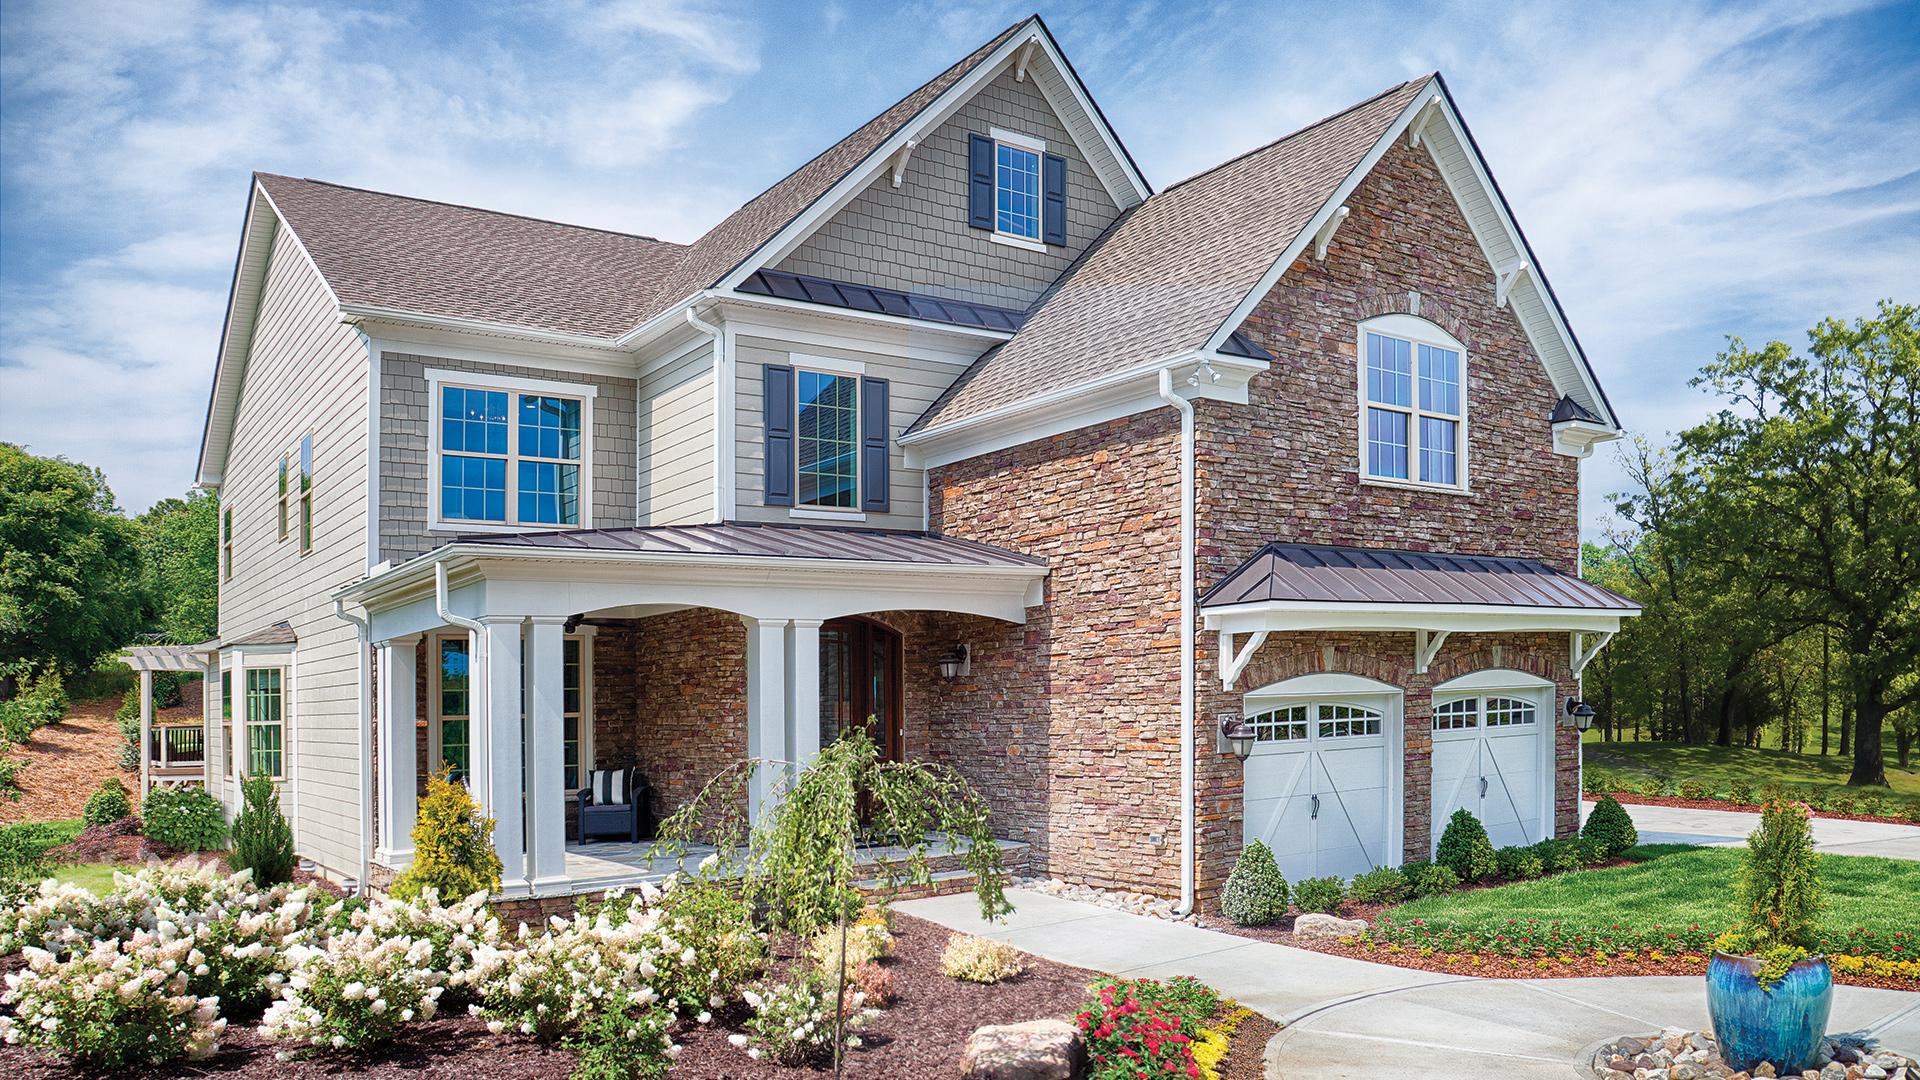 Stunning single-family home designs